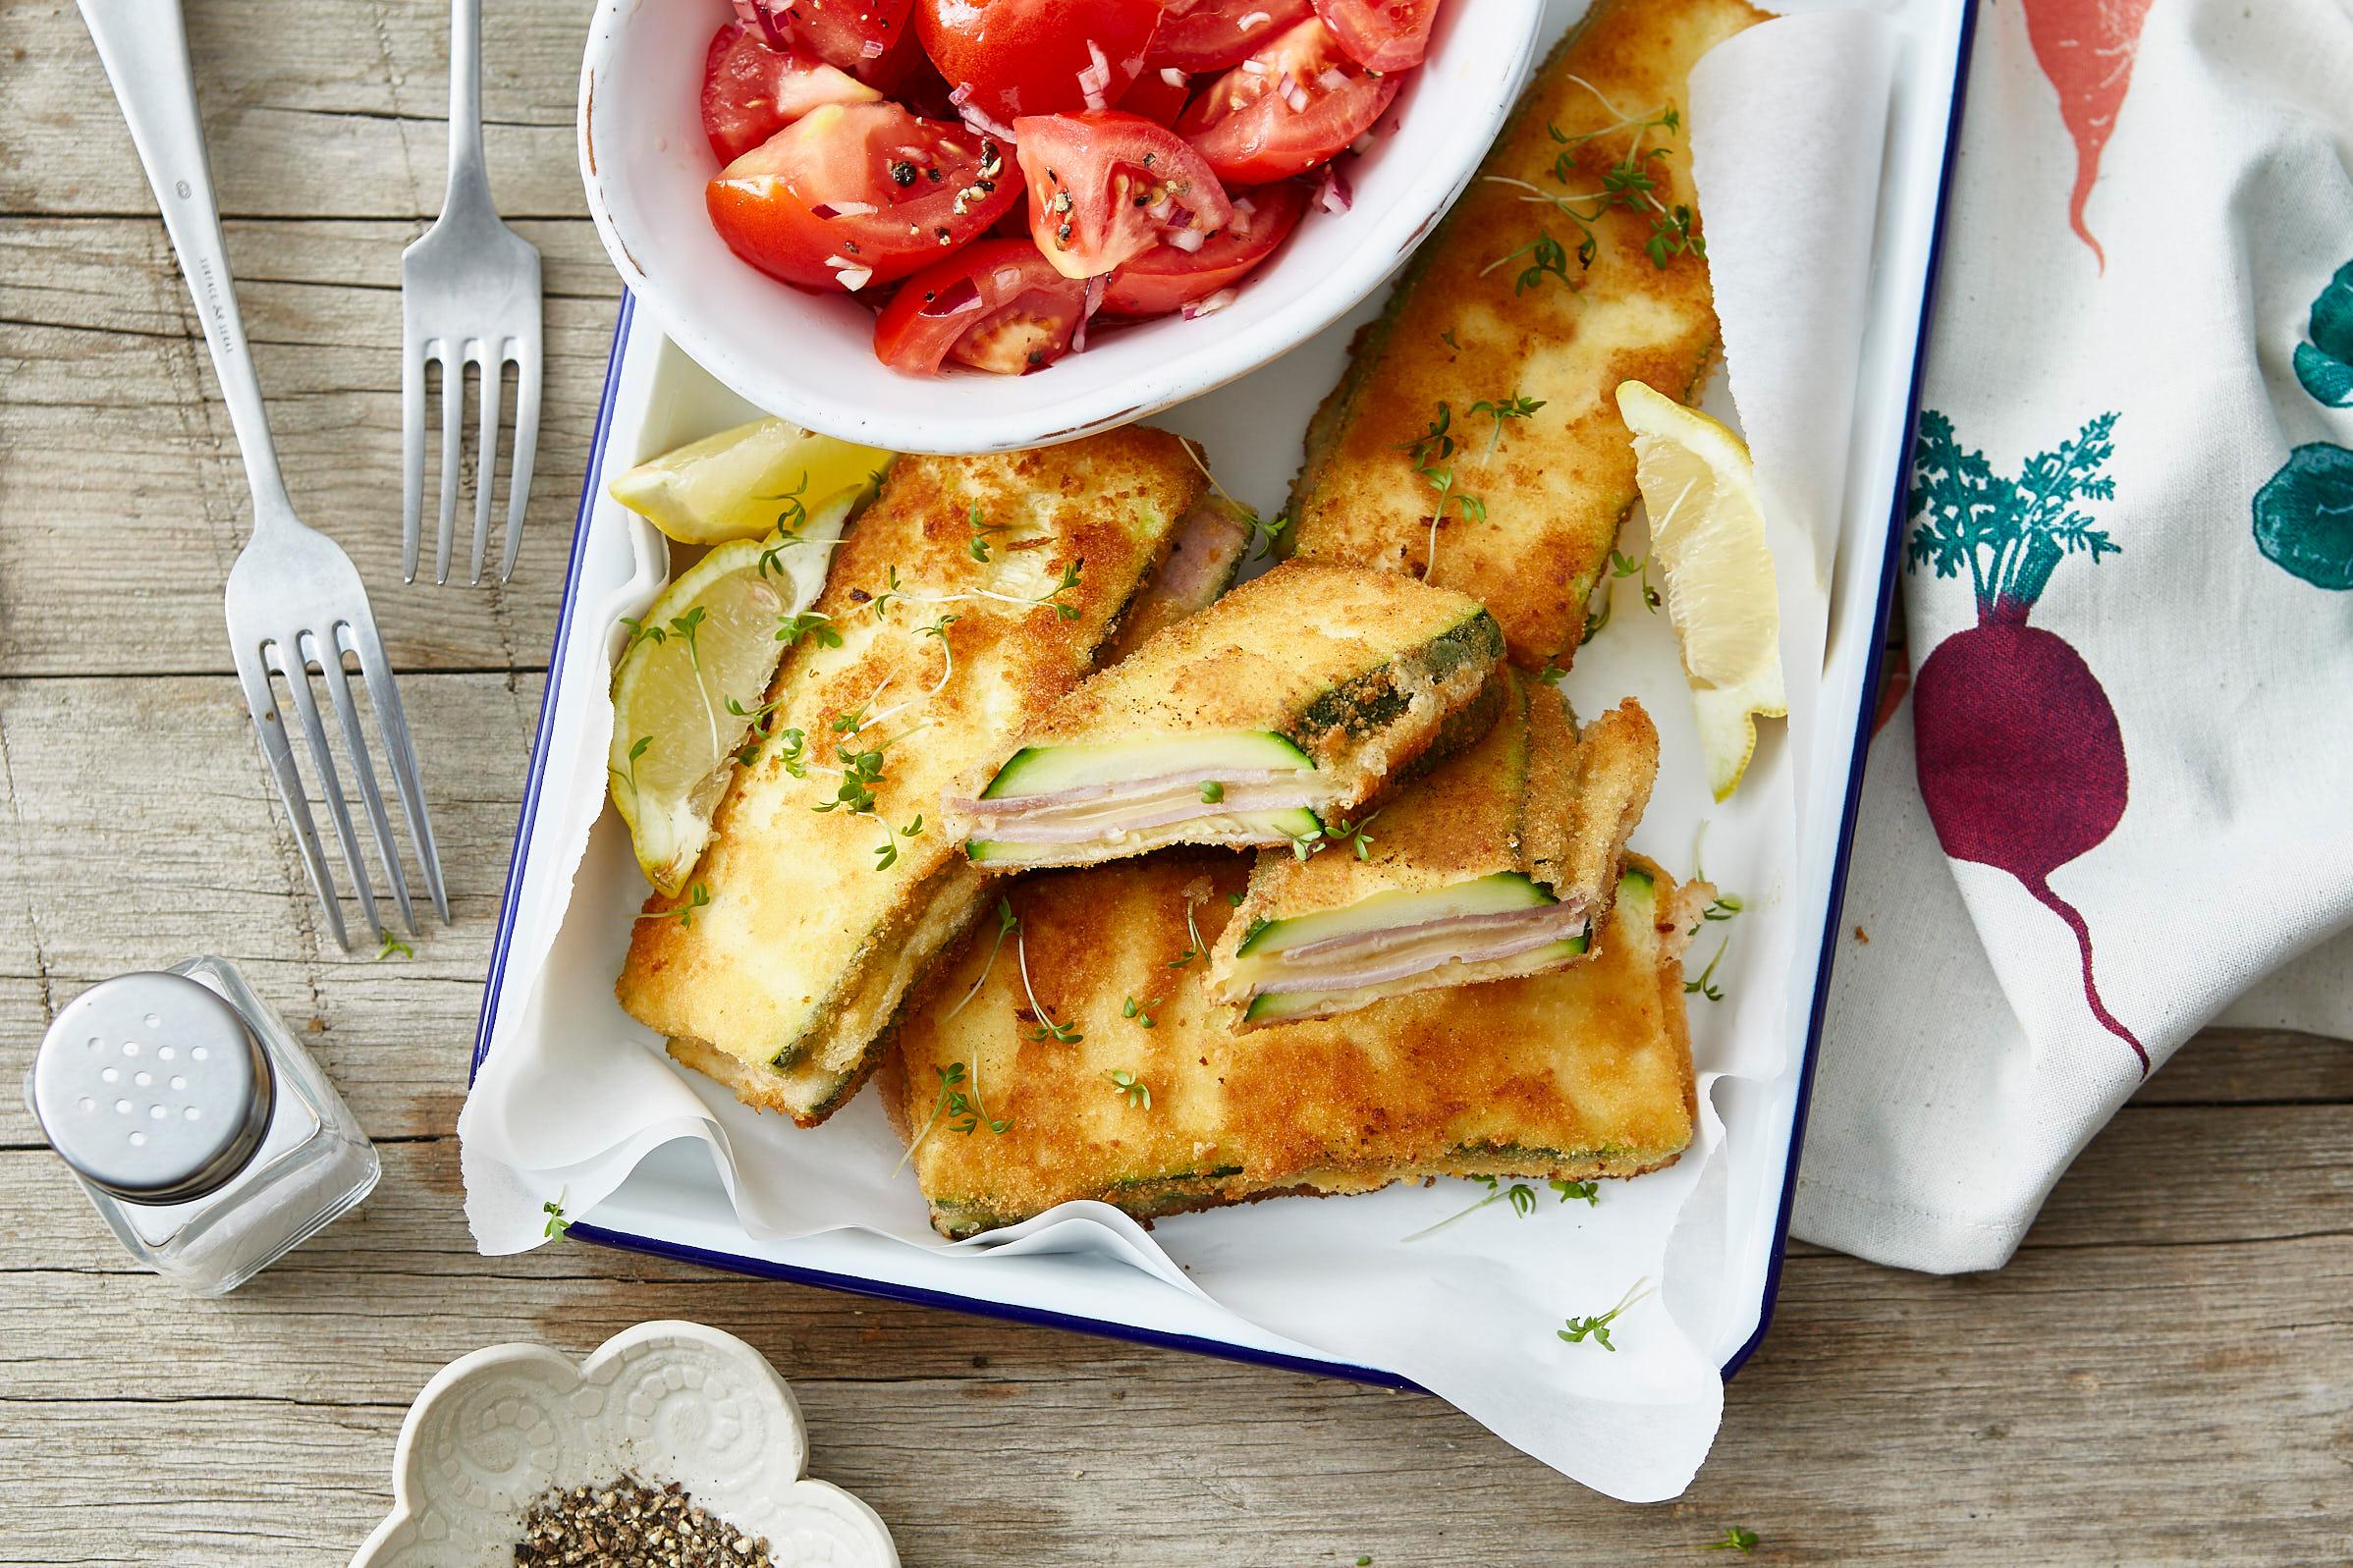 Familienküchen_Zucchini-Schnitzel_Cordon_Bleu_ 2